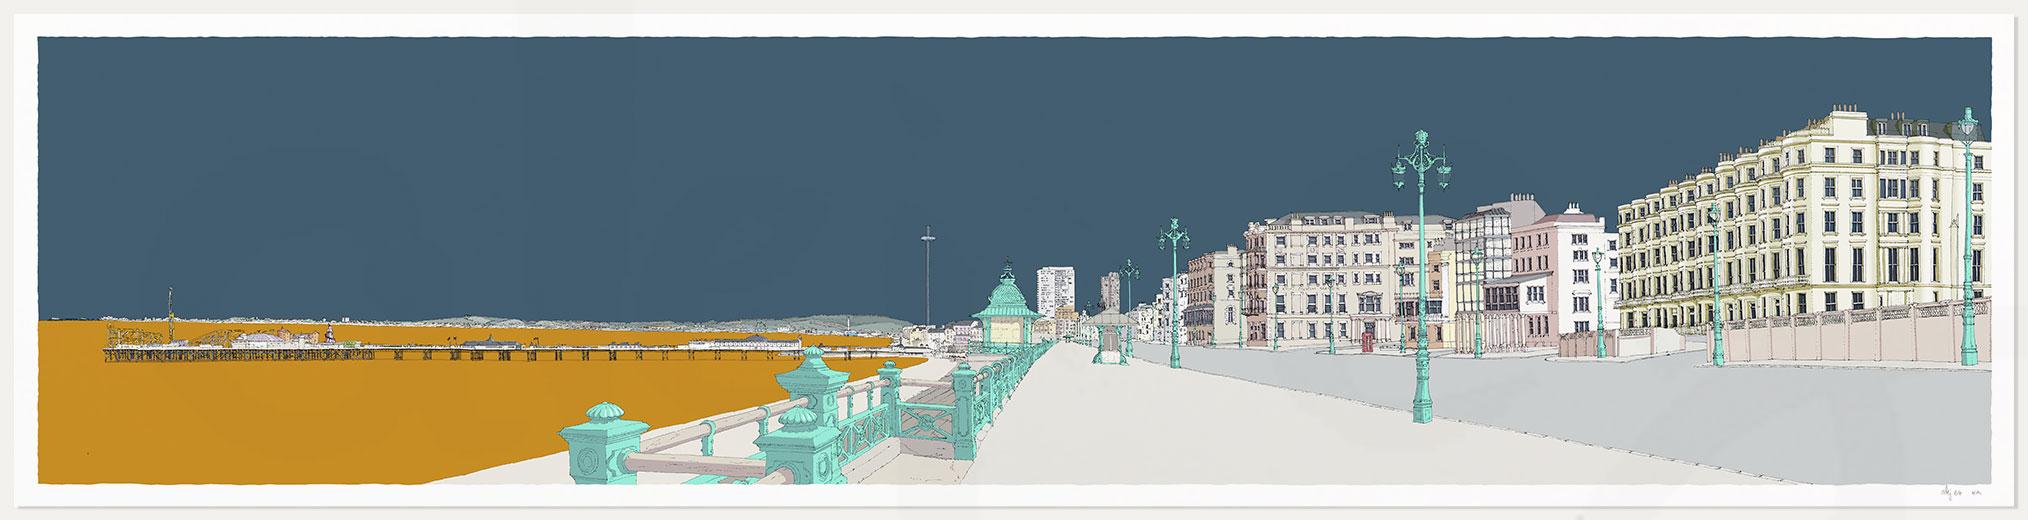 print named Kemptown Brighton Promenade Antique Blue and Ochre by artist alej ez